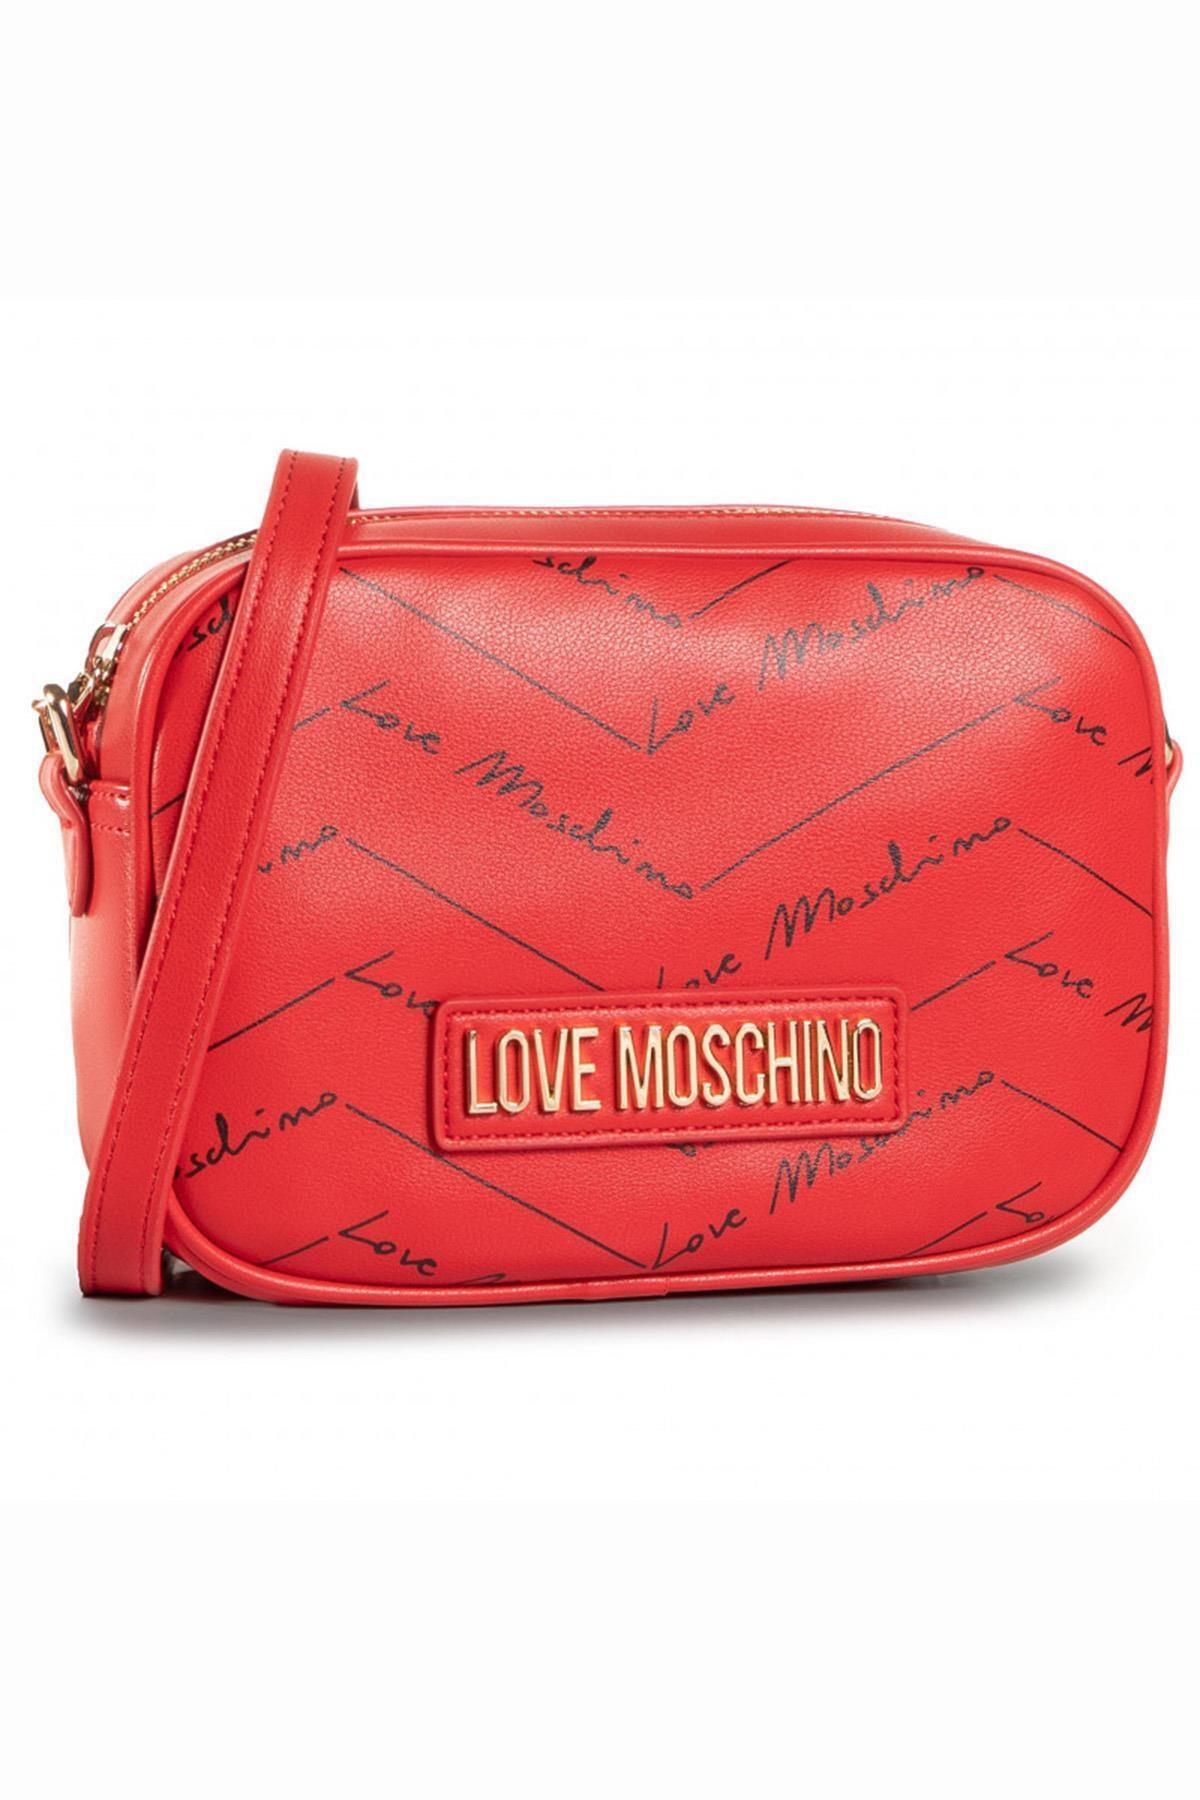 Love Moschino Love Moschıno Jc4246pp0bkh0 Kırmızı Kadın Omuz Çantası 1